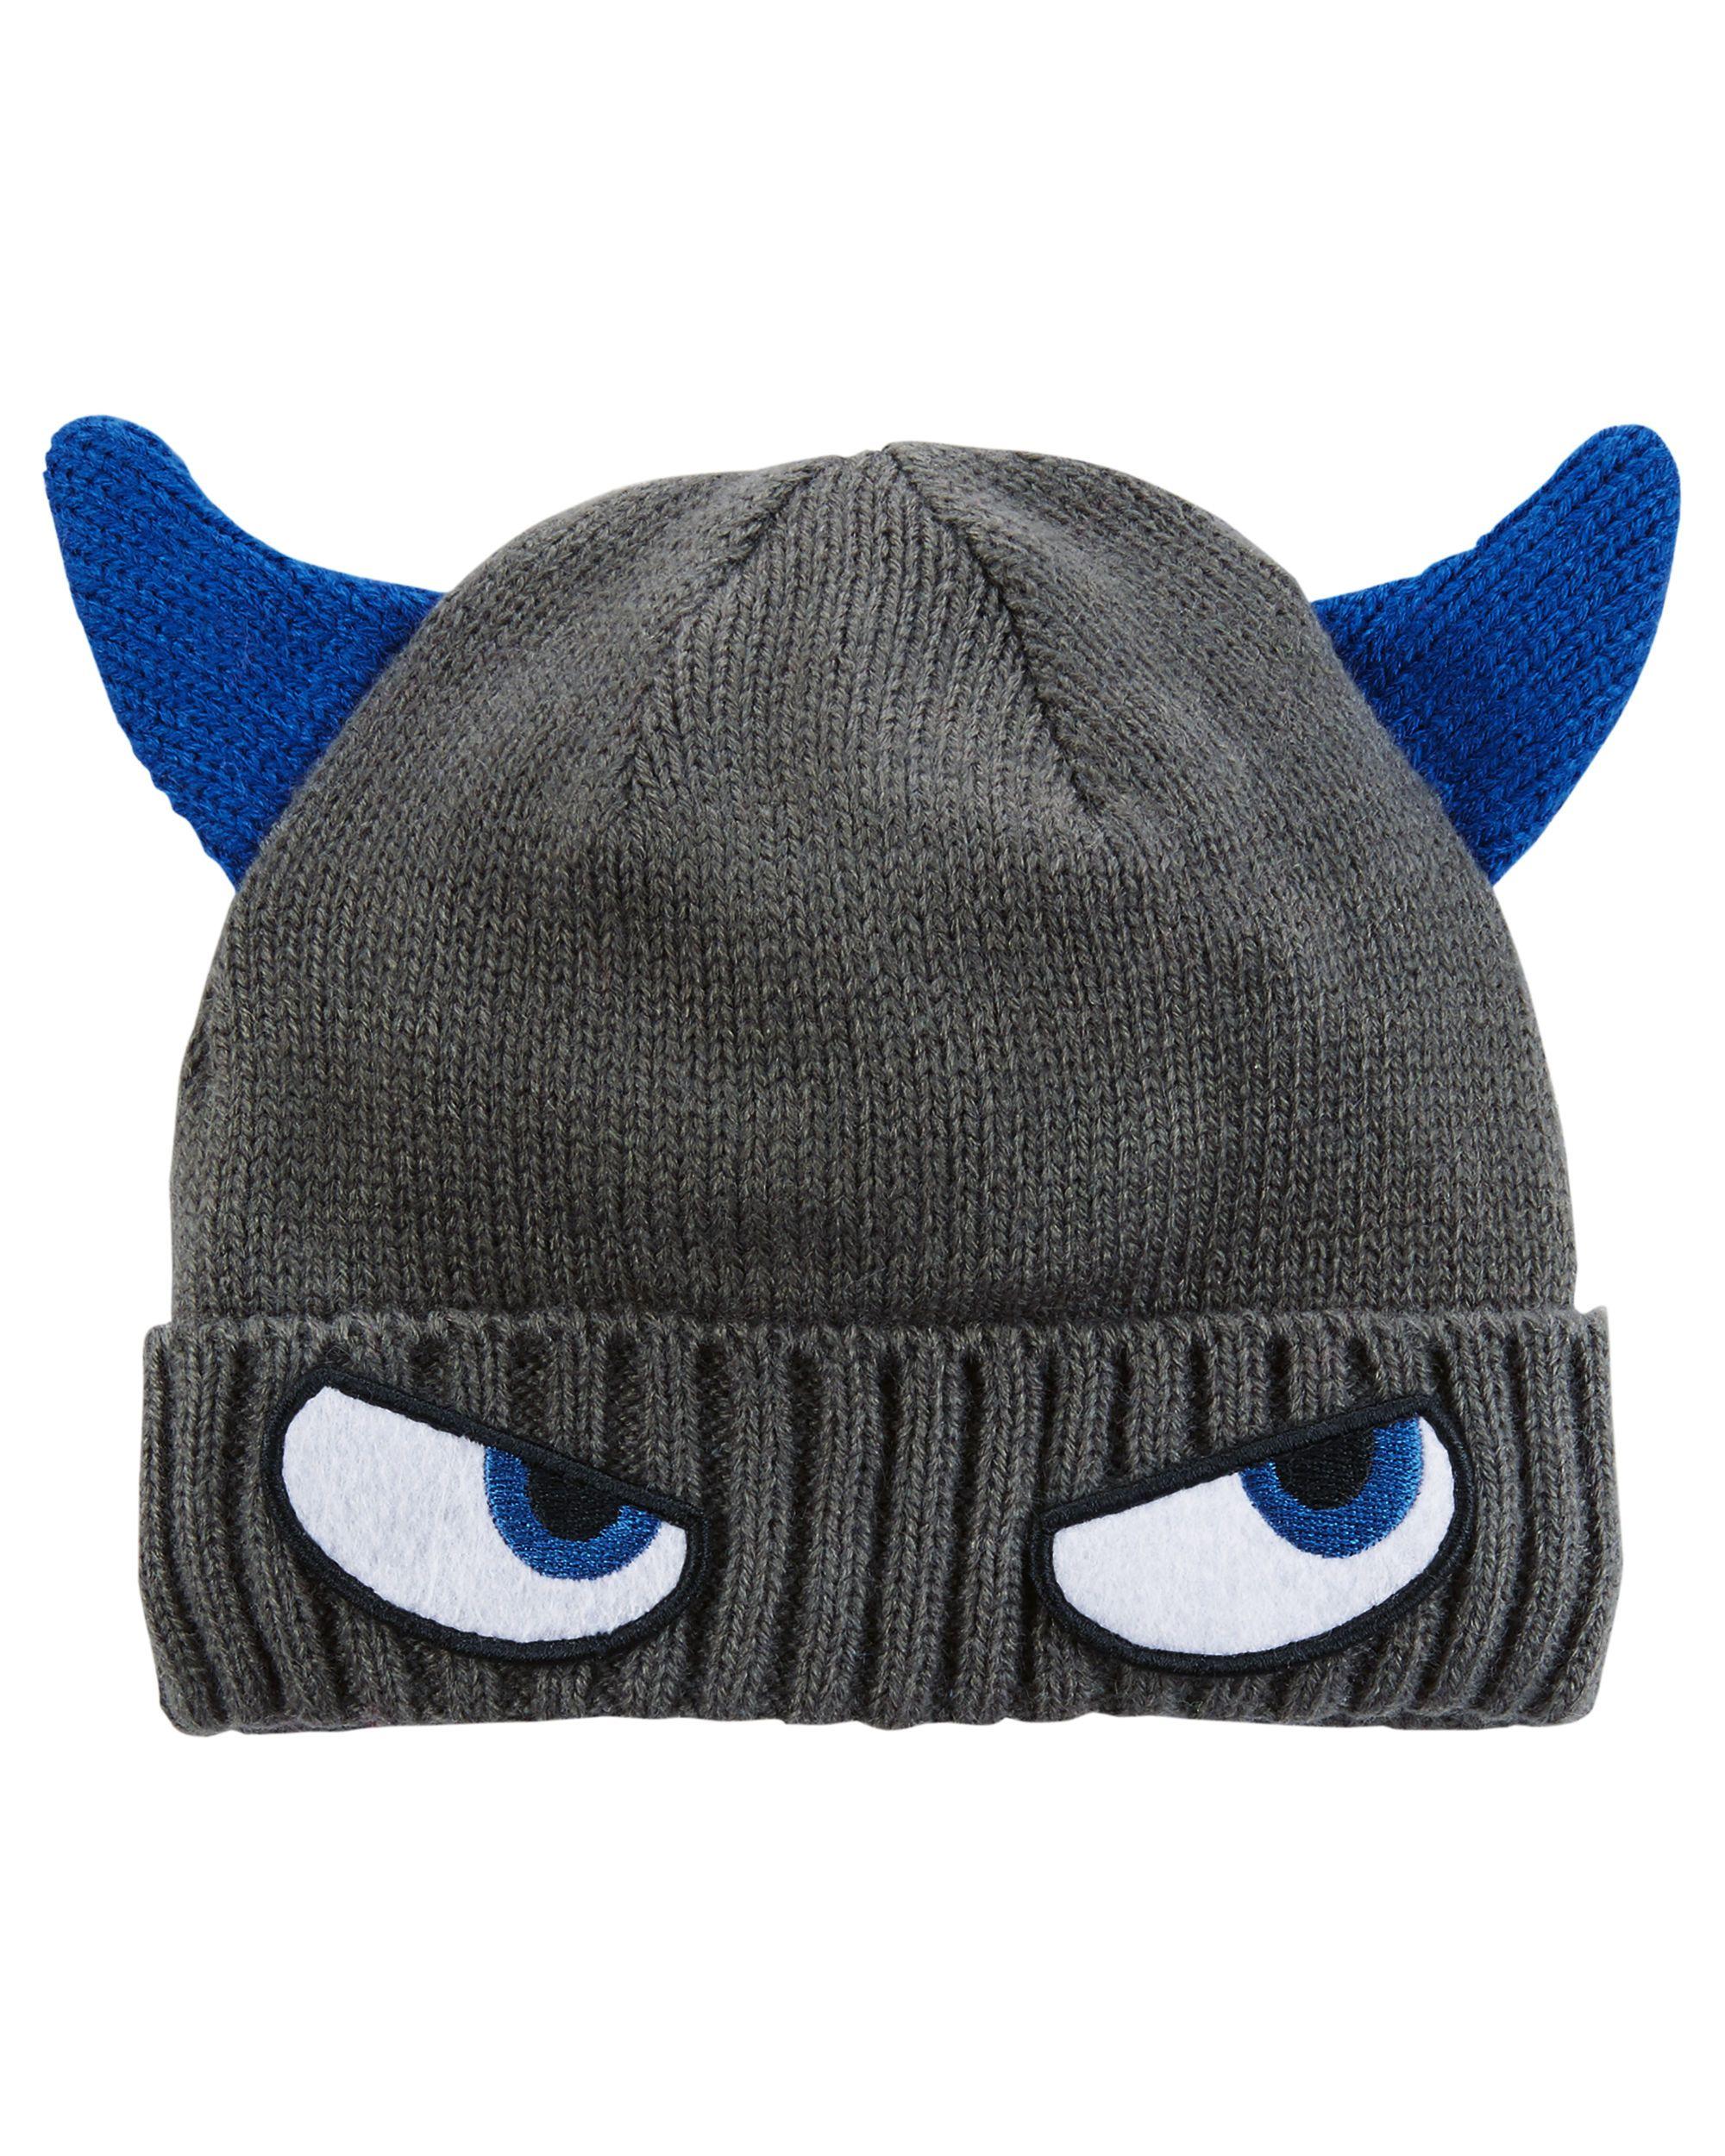 ba4974342edb2 Knit Character Hat | Kids ❤ | Hats, Toddler boys, Carter kids